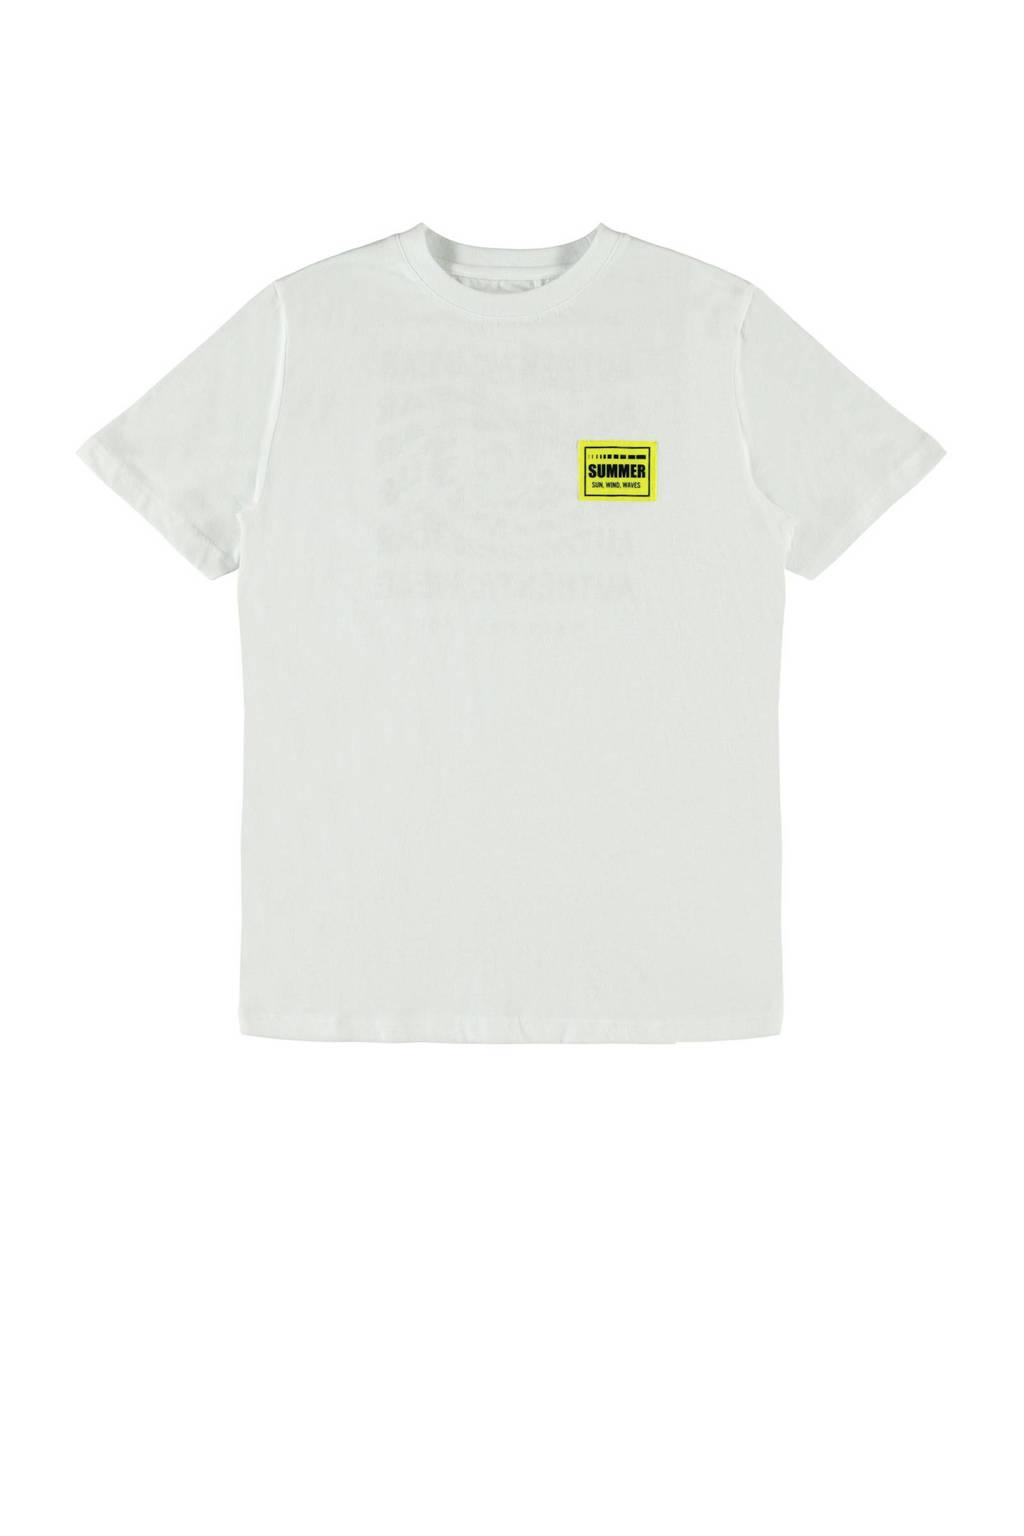 LMTD T-shirt Hanjo met printopdruk wit-zwart, WIT-ZWART